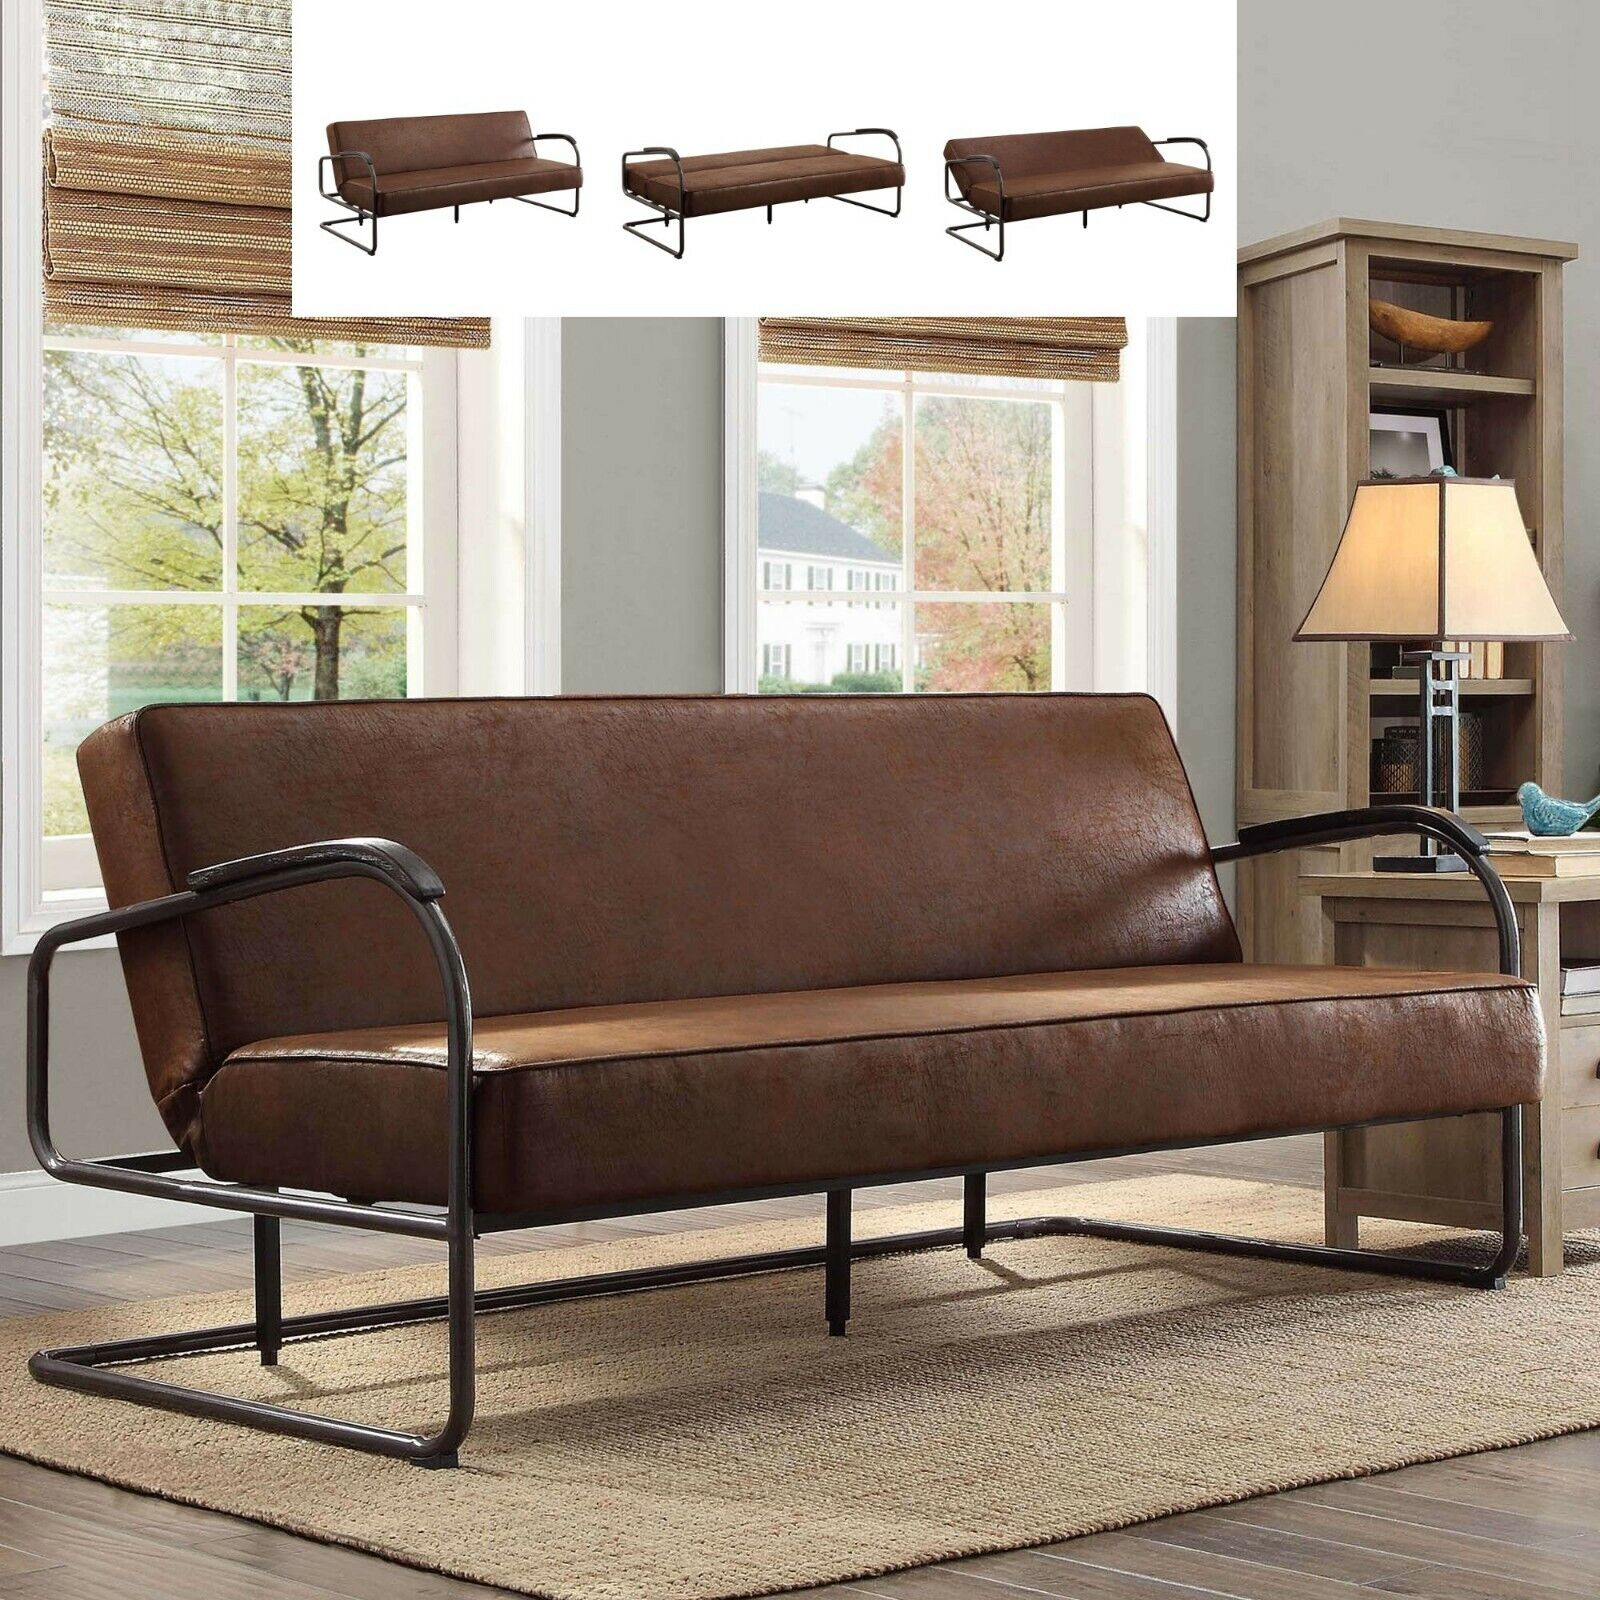 Rustic Futon Sofa Bed Sleeper Full Faux Leather Loveseat Living Room  Furniture